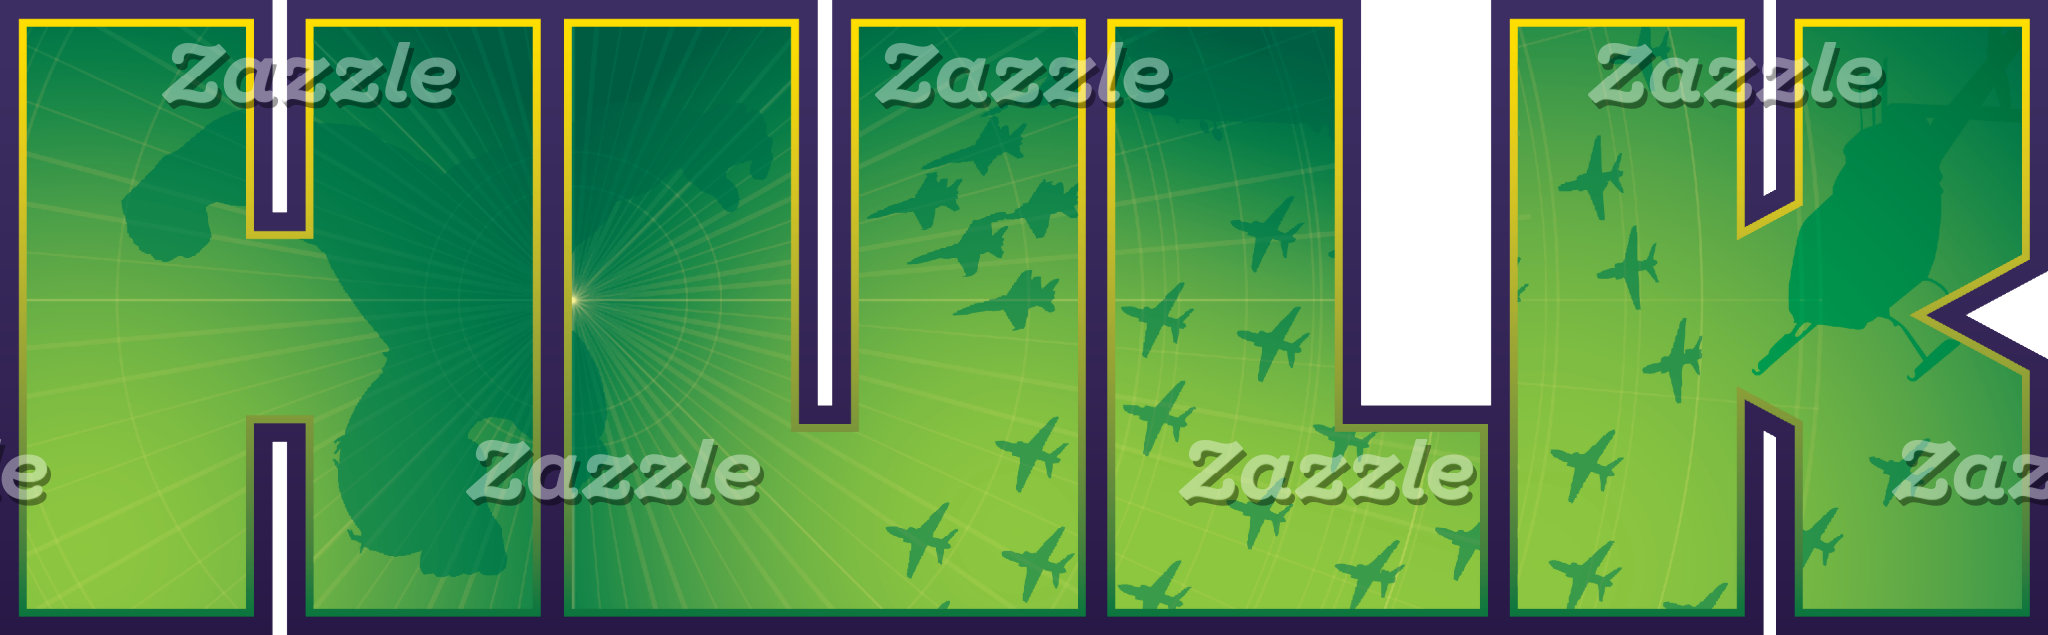 The Hulk Jet Plane Fugitive Logo